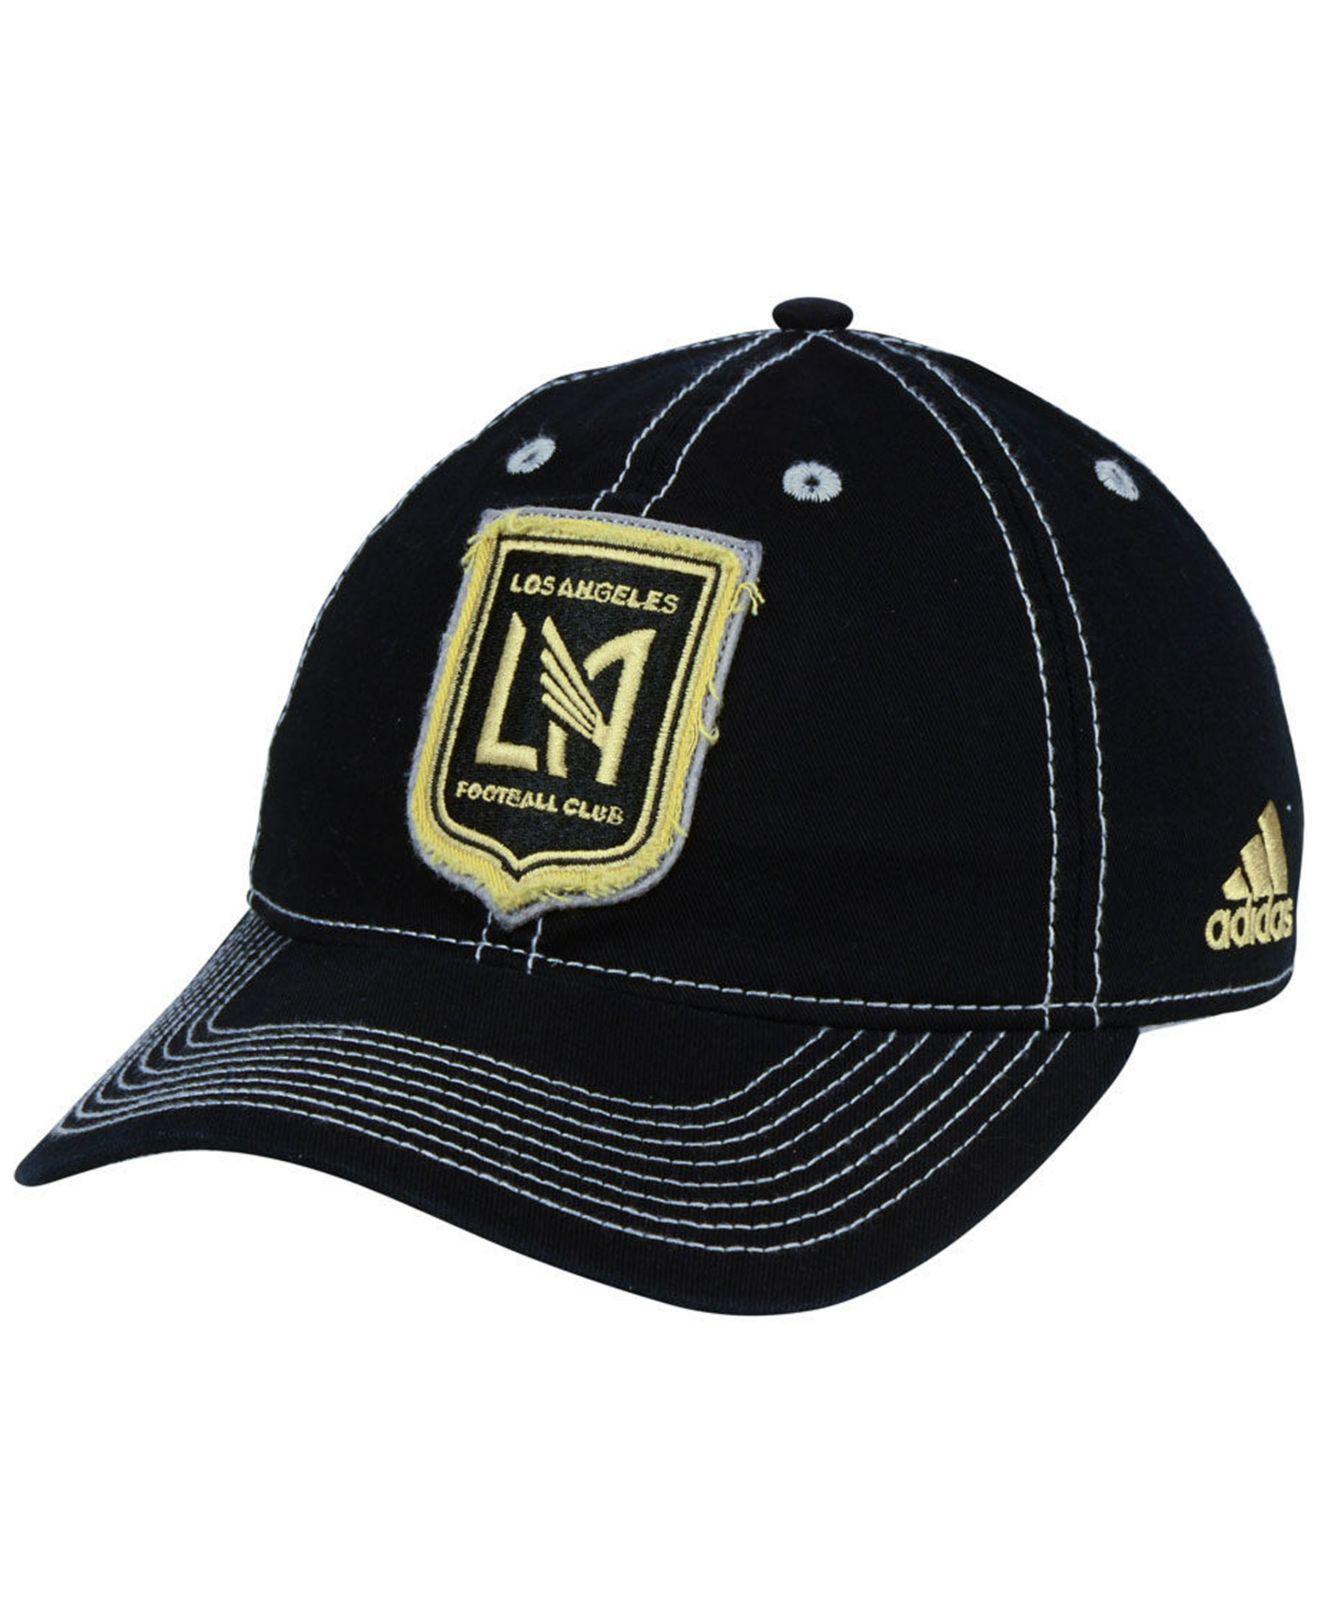 cheap for discount 541e1 efddf ... snapback hat 5d535 f42a7  wholesale adidas. mens black los angeles  football club sand blast adjustable cap b2d4e ce1cf